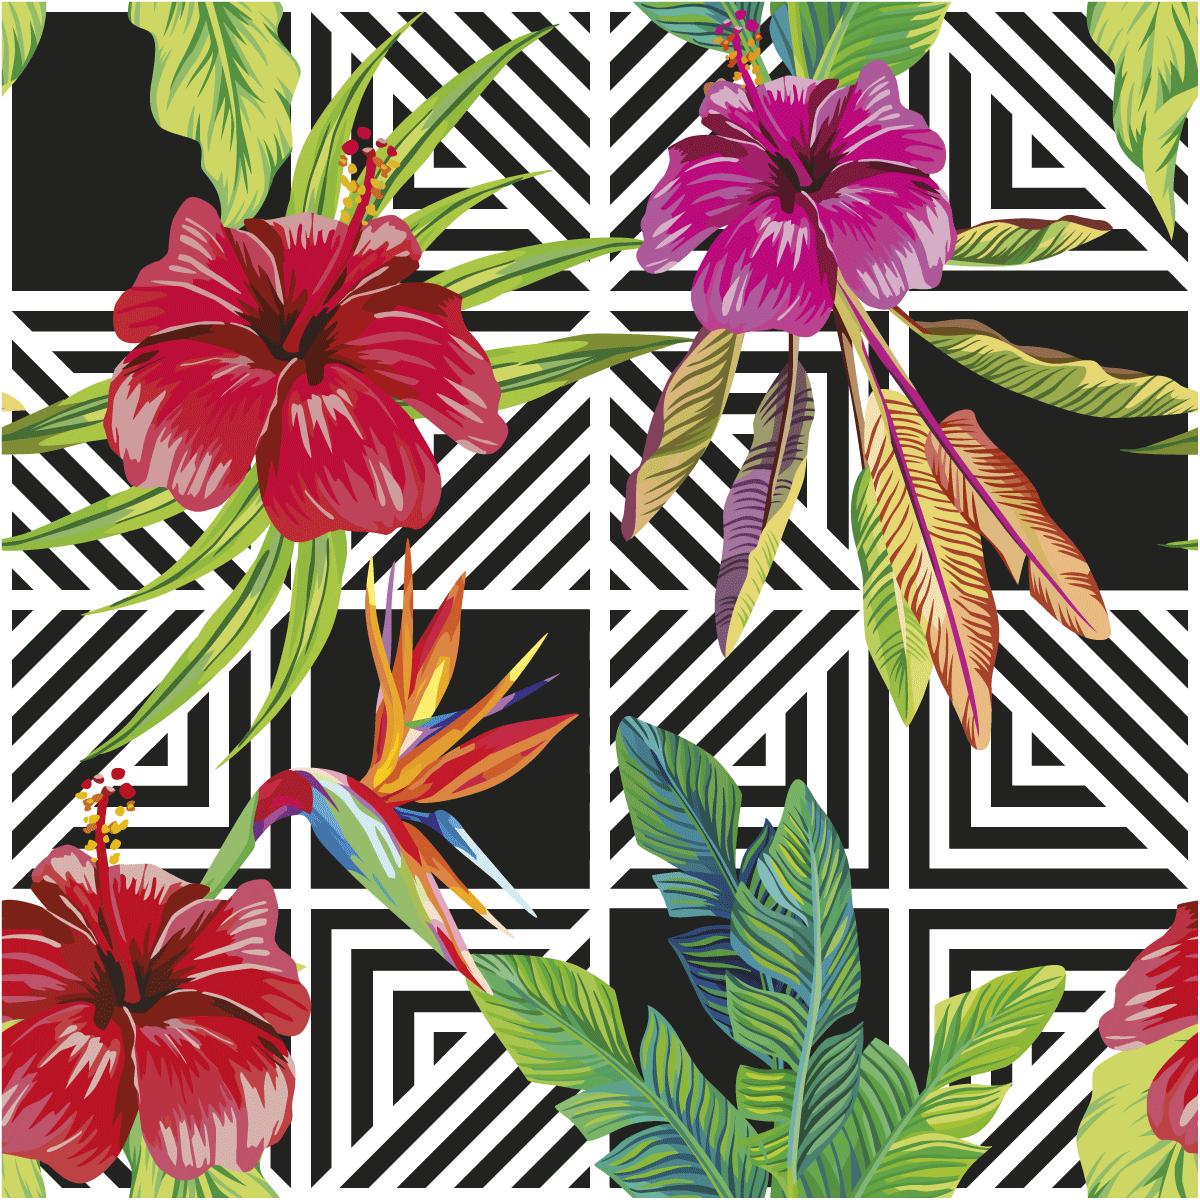 Sticker Papier Peint Tropical Grenada Nature Fleurs Ambiance Sticker